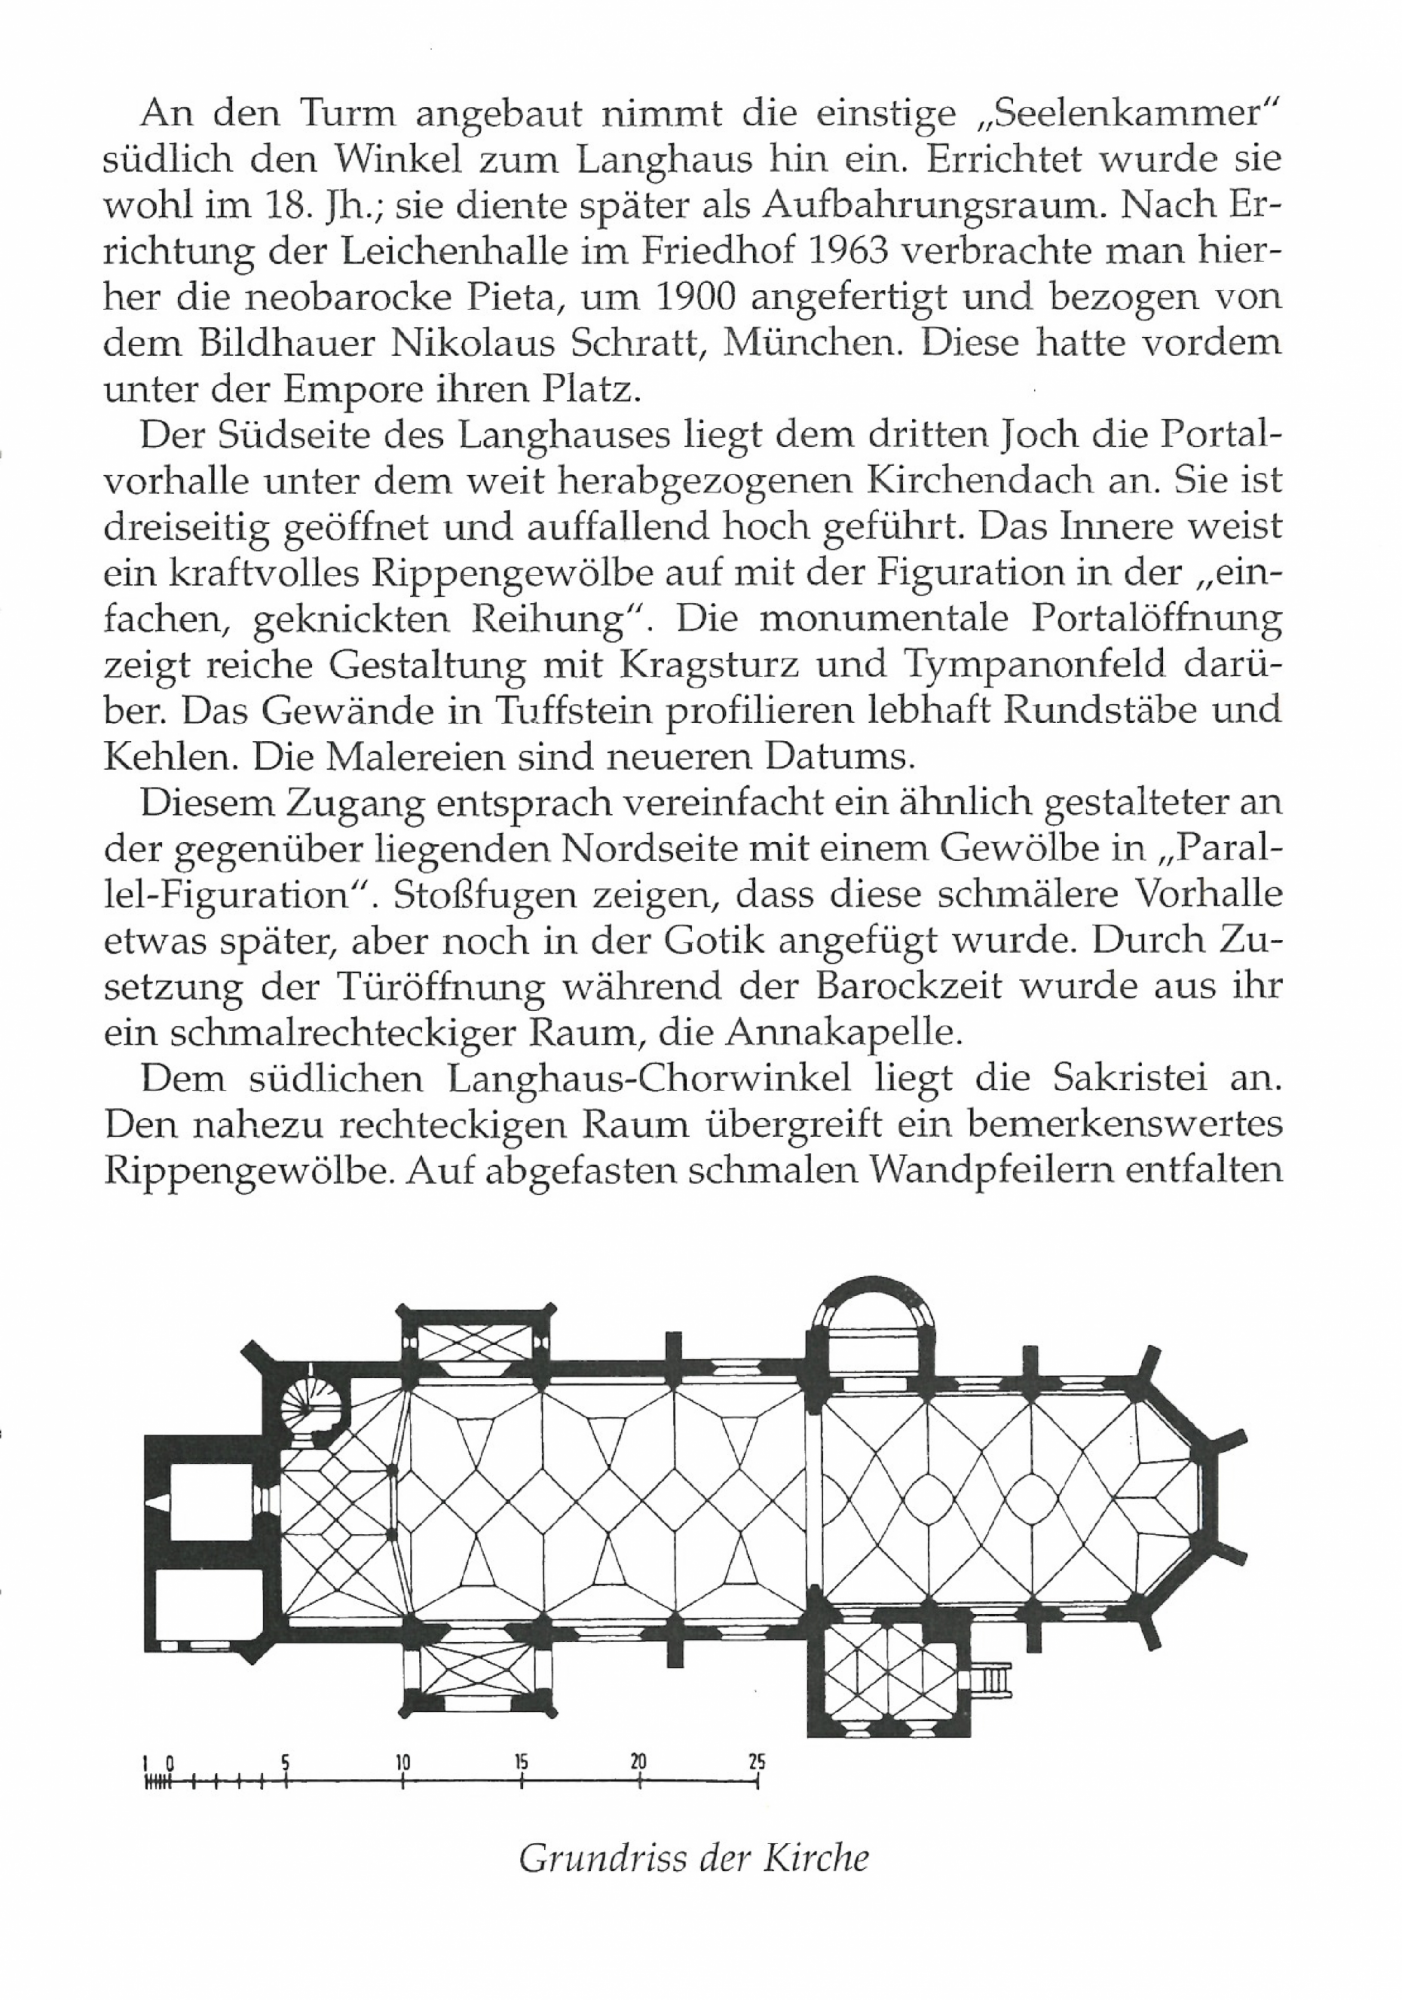 Erlach Kirchenführer 007